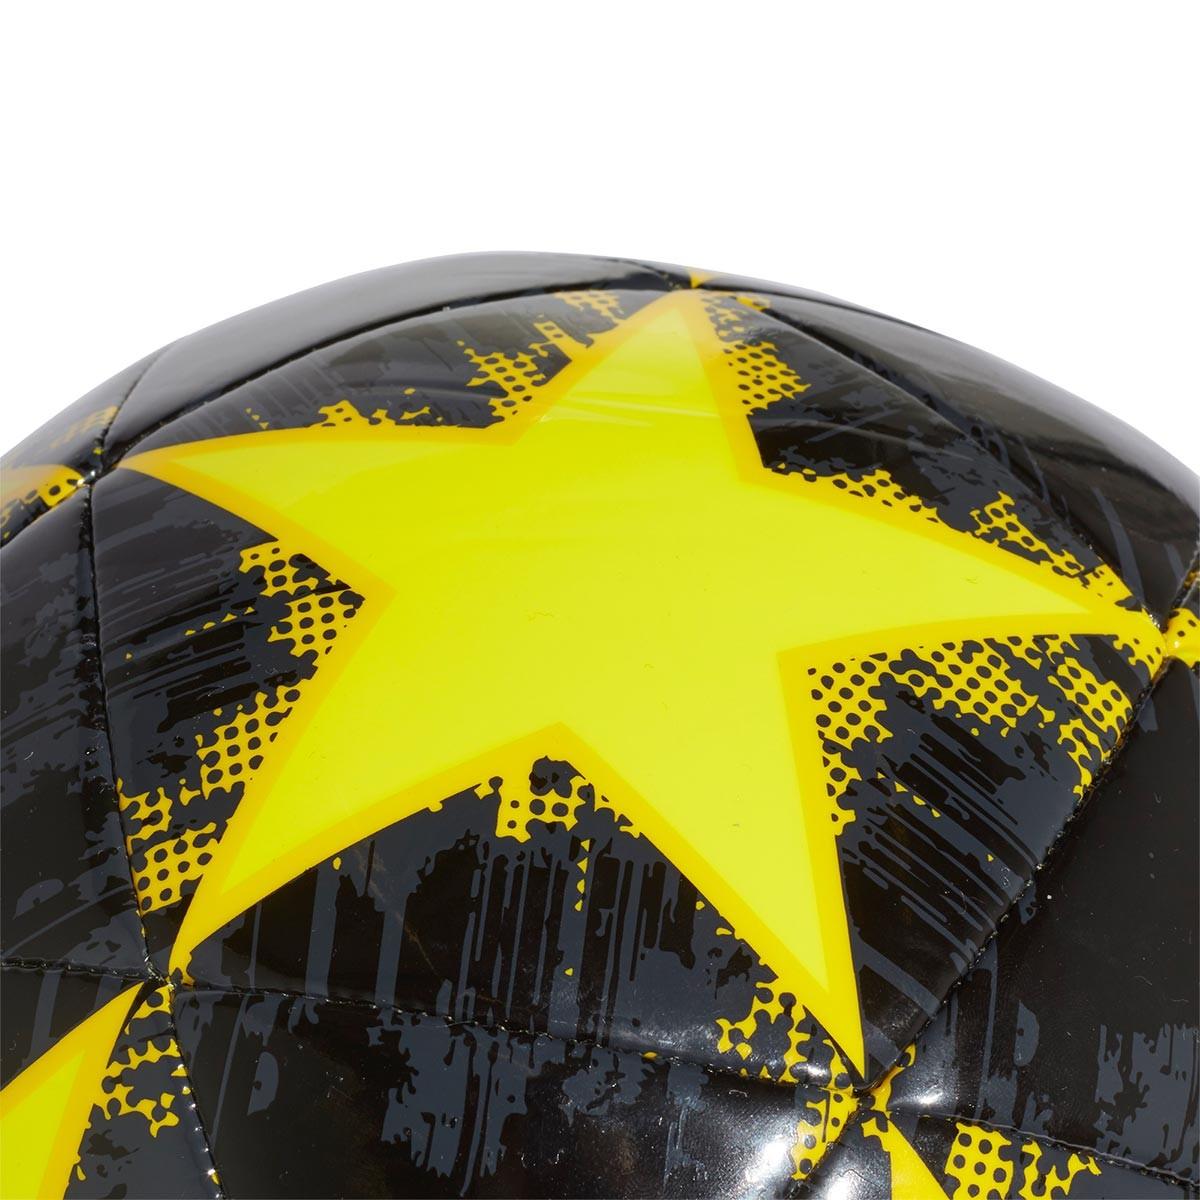 c72900e331acd Balón adidas Finale18 Juventus Capitano 2018-2019 Shock  yellow-Yellow-Carbon-Black - Tienda de fútbol Fútbol Emotion